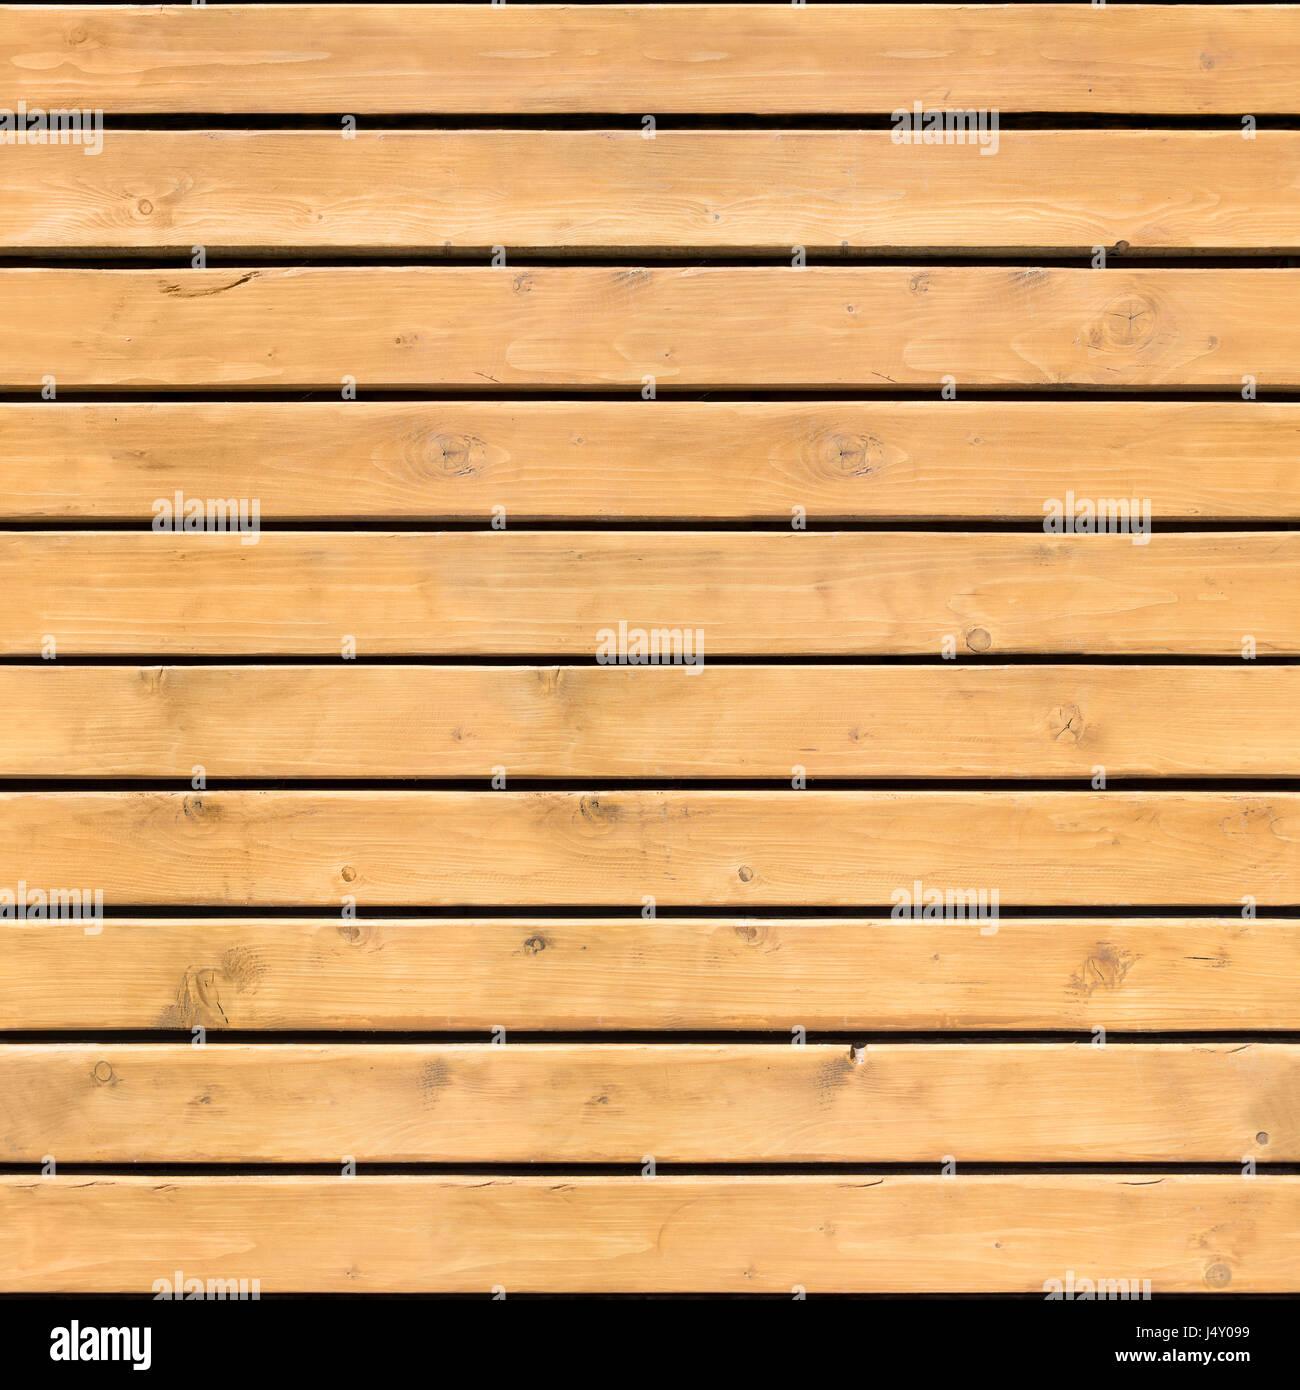 horizontal wood background. Brilliant Wood Seamless Pattern Of Brown Wooden Horizontal Planks Horizontal And Vertical  Seamless Light Wood Texture Background Throughout Wood Background W